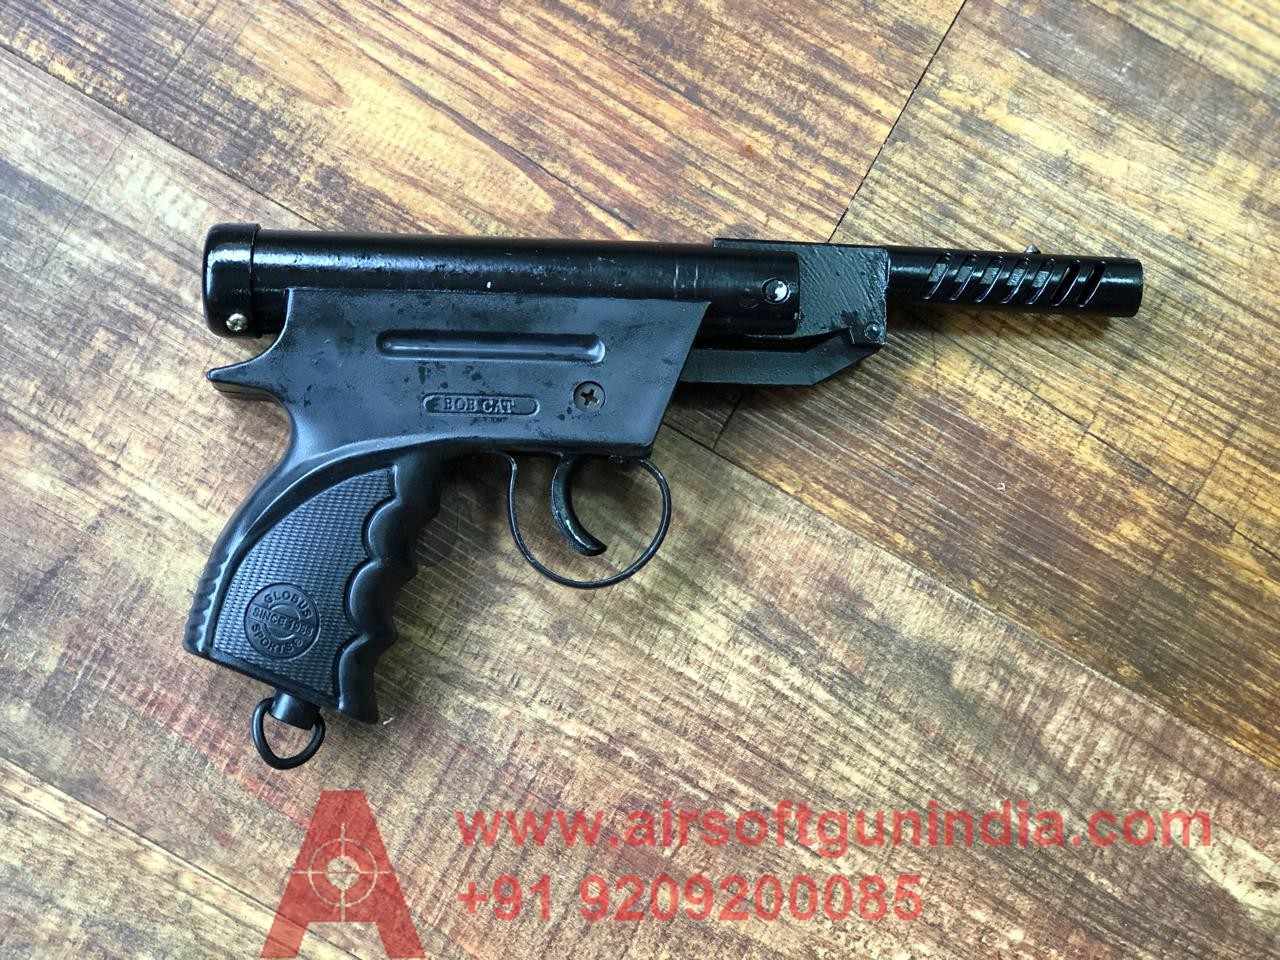 Globus BOB Cats Sports Cheap Air Pistol By Airsoft Gun India